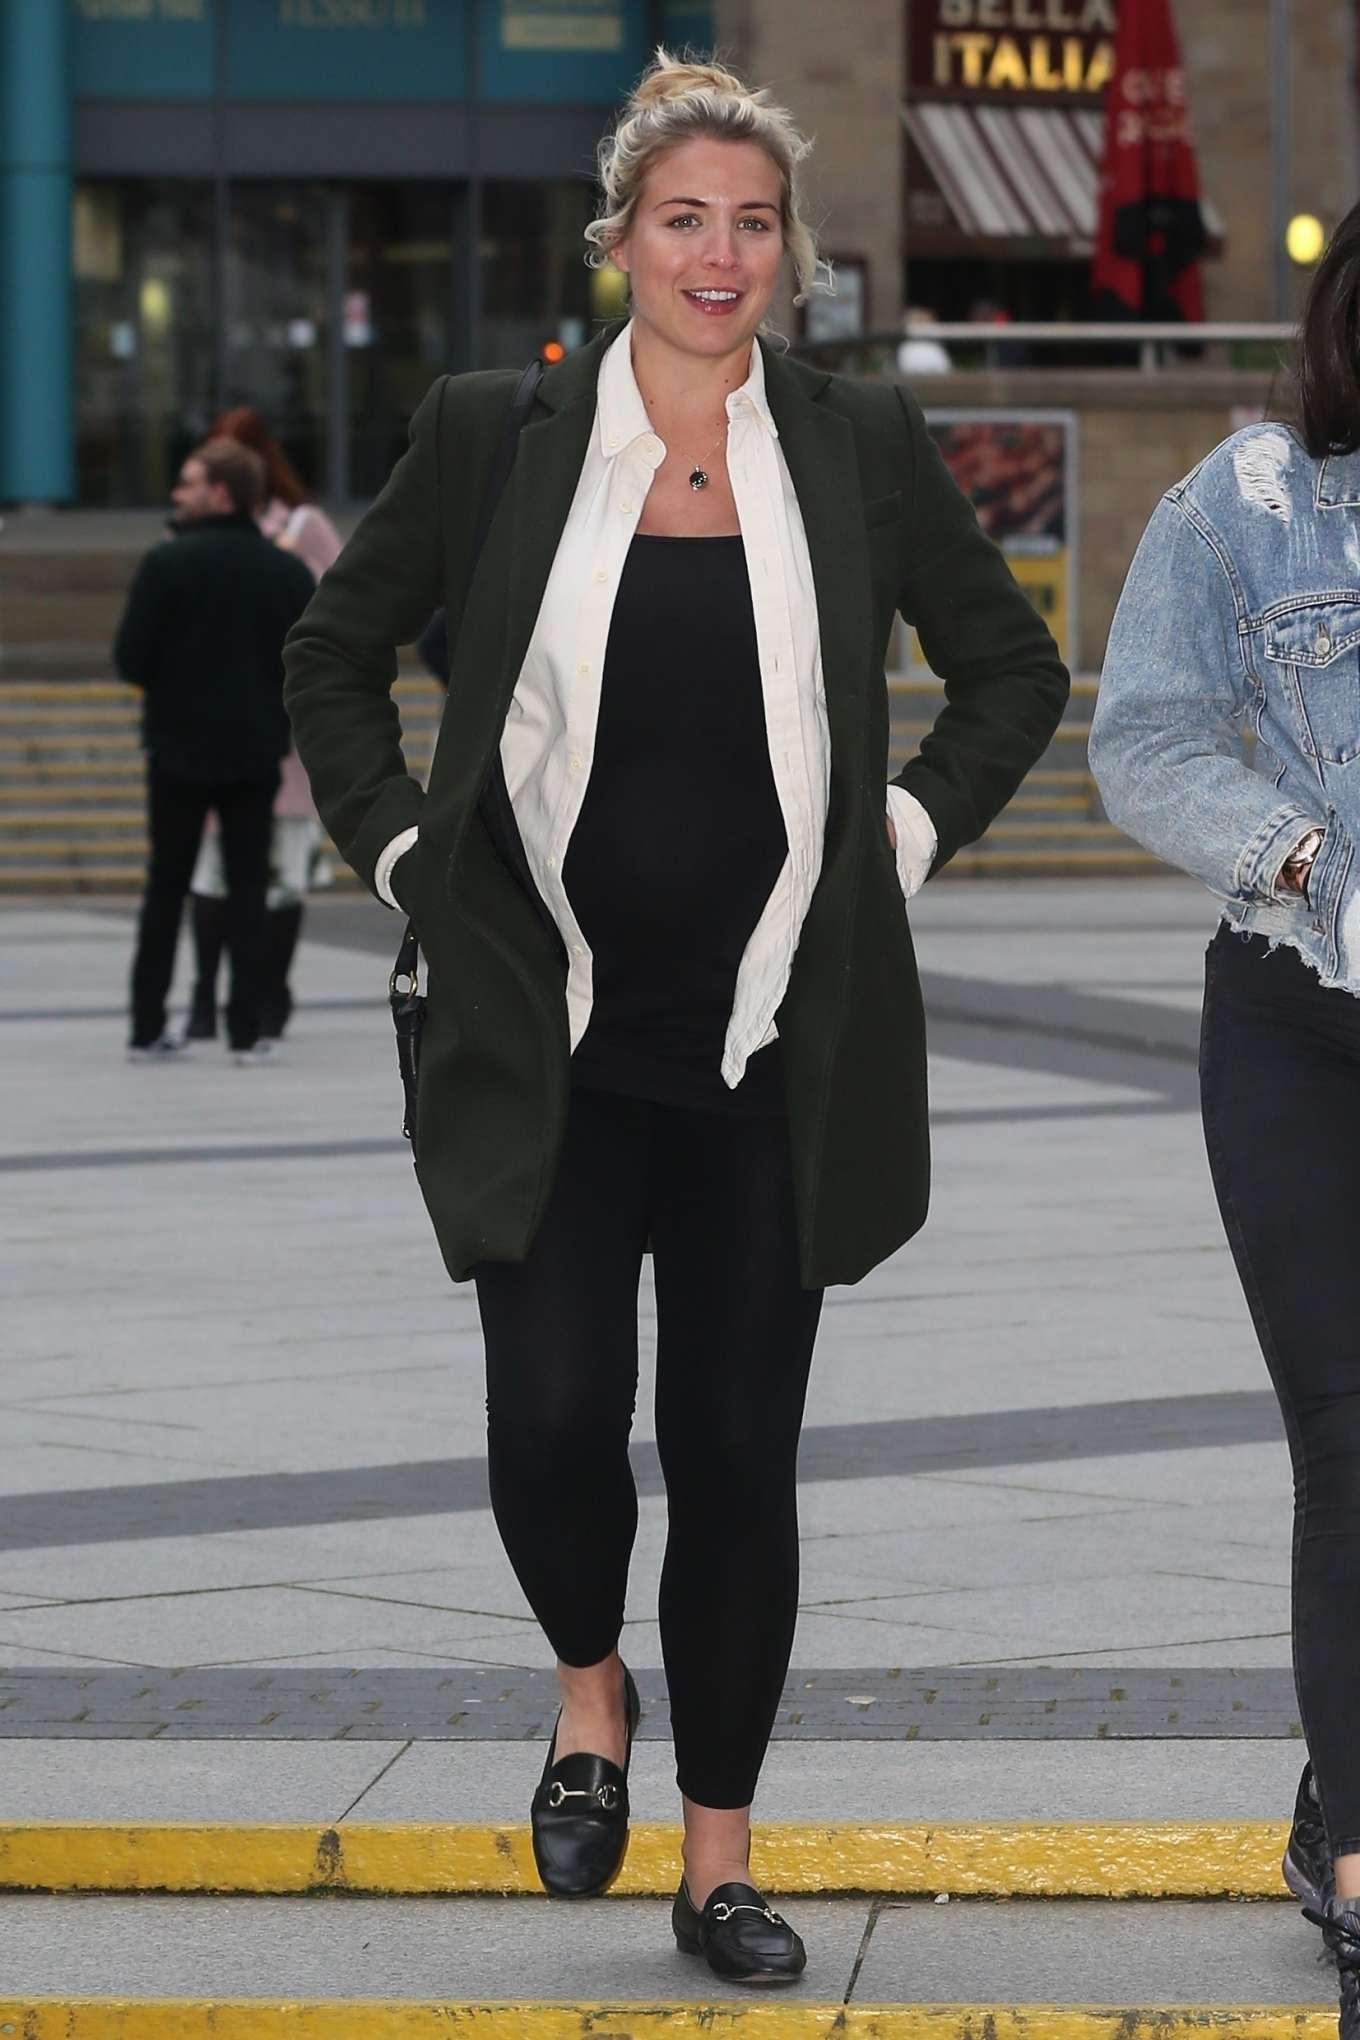 Gemma Atkinson 2019 : Gemma Atkinson :Arriving at The Lowry -06